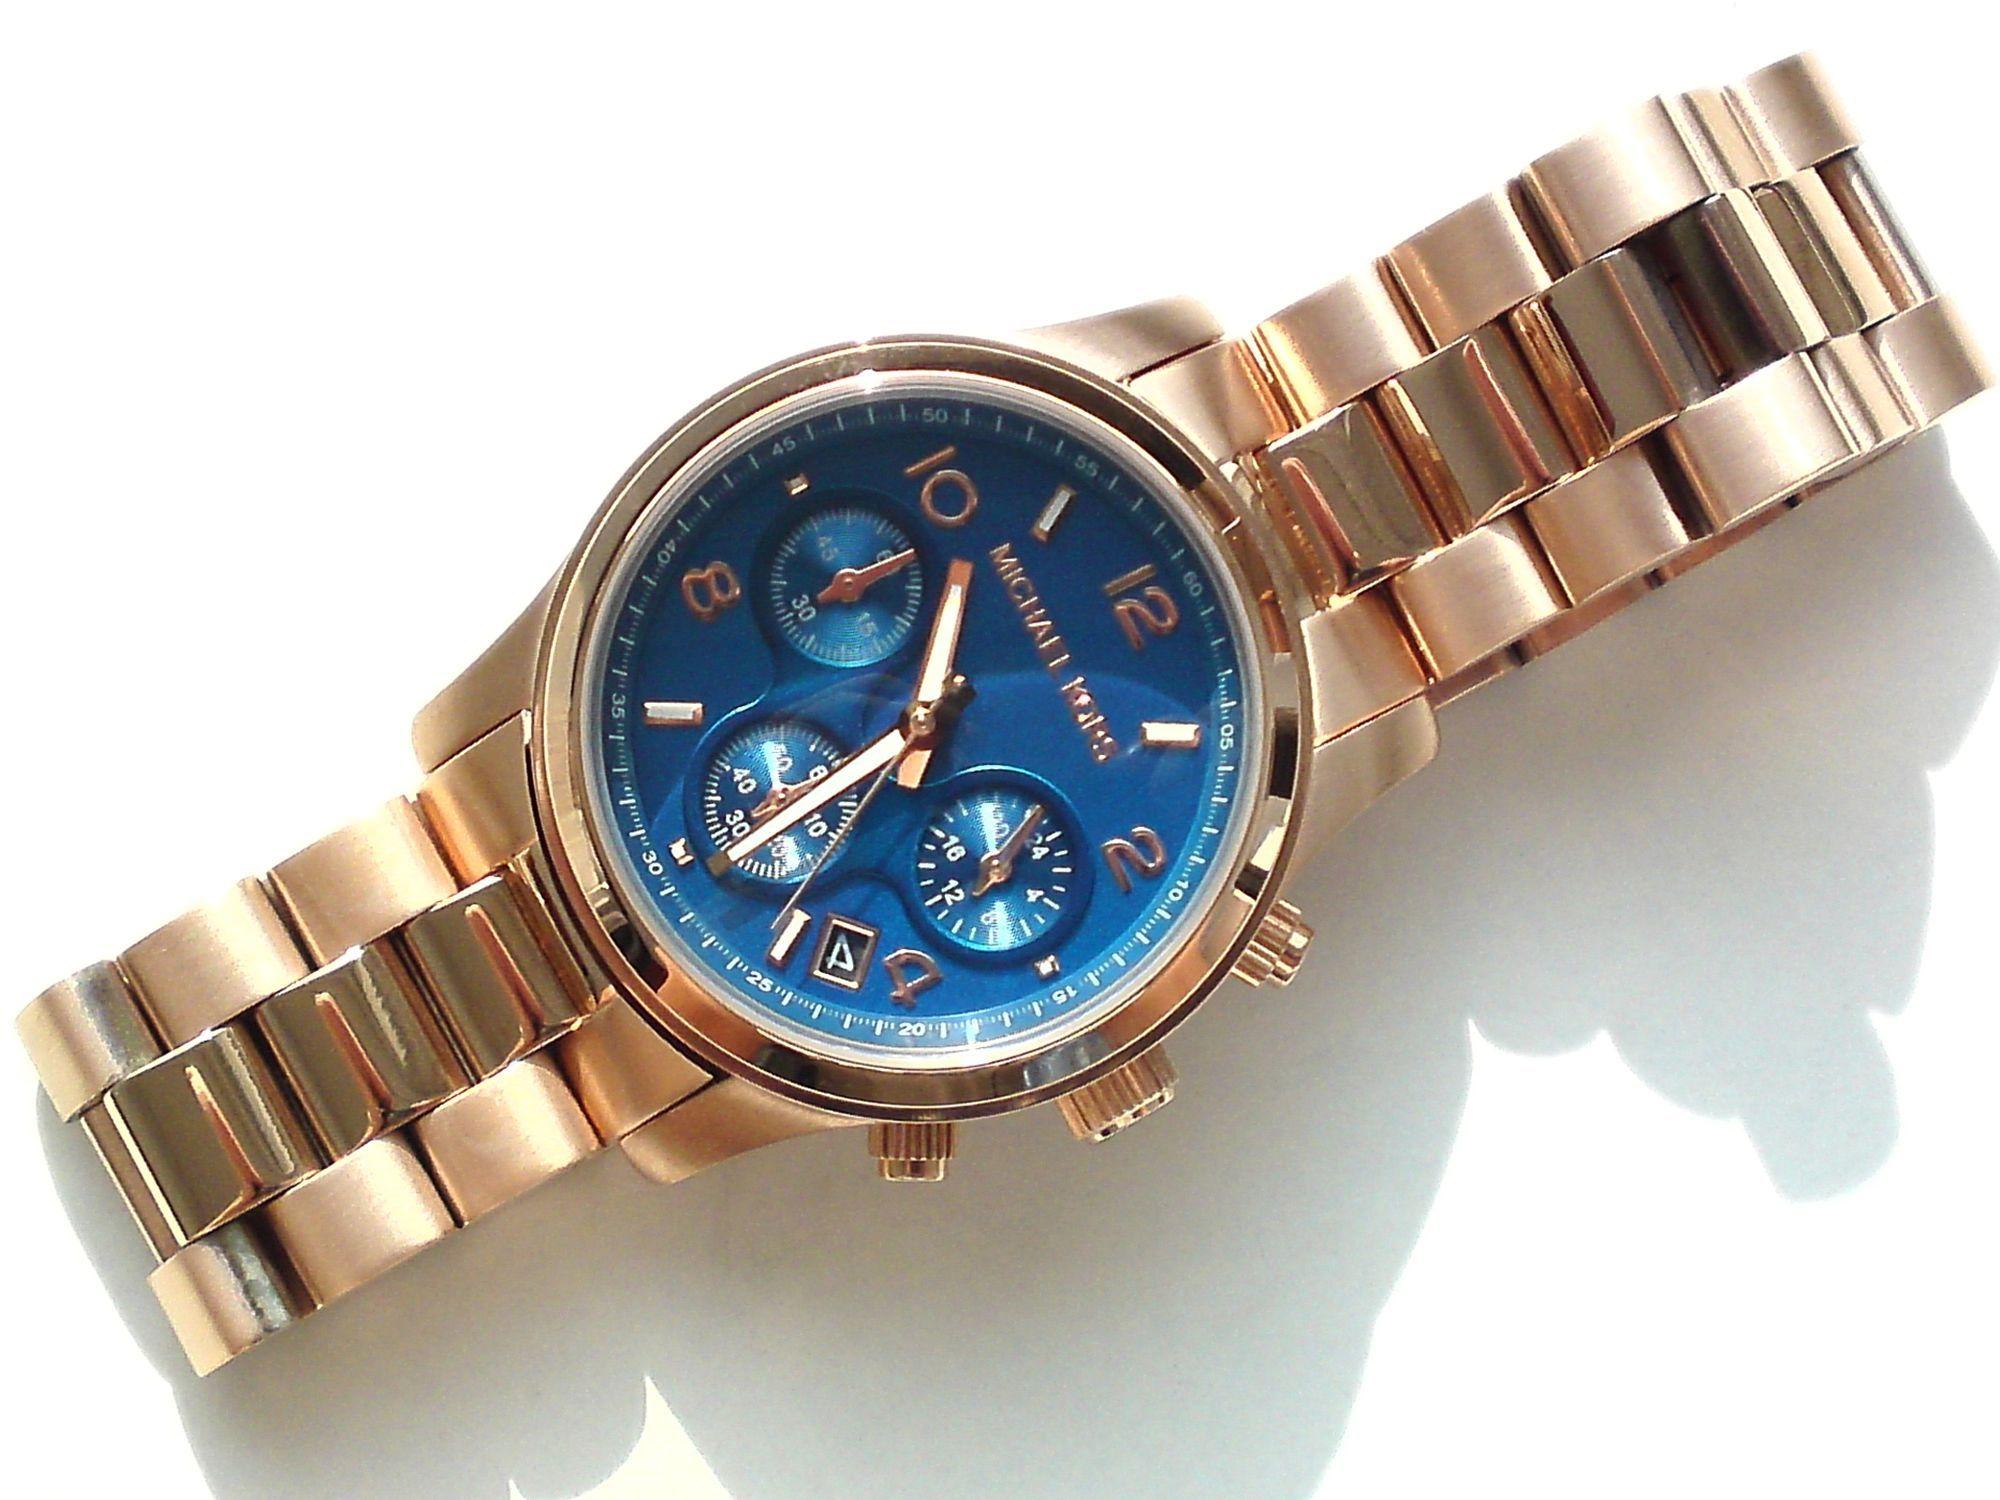 michael kors mk5940 damen armband uhr chronograph. Black Bedroom Furniture Sets. Home Design Ideas